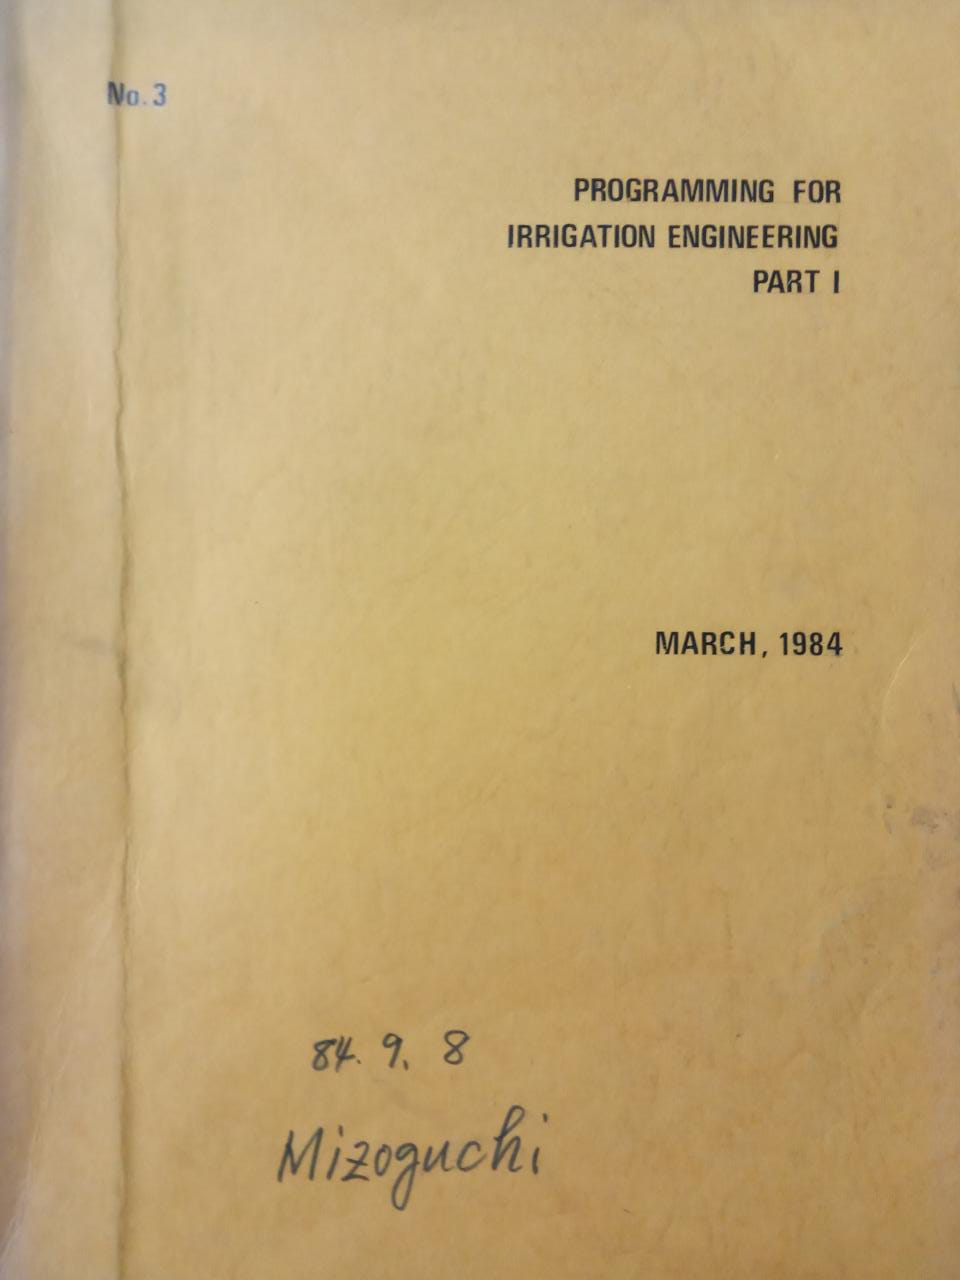 PROGRAMMING FOR IRRIGATION ENGINEERING